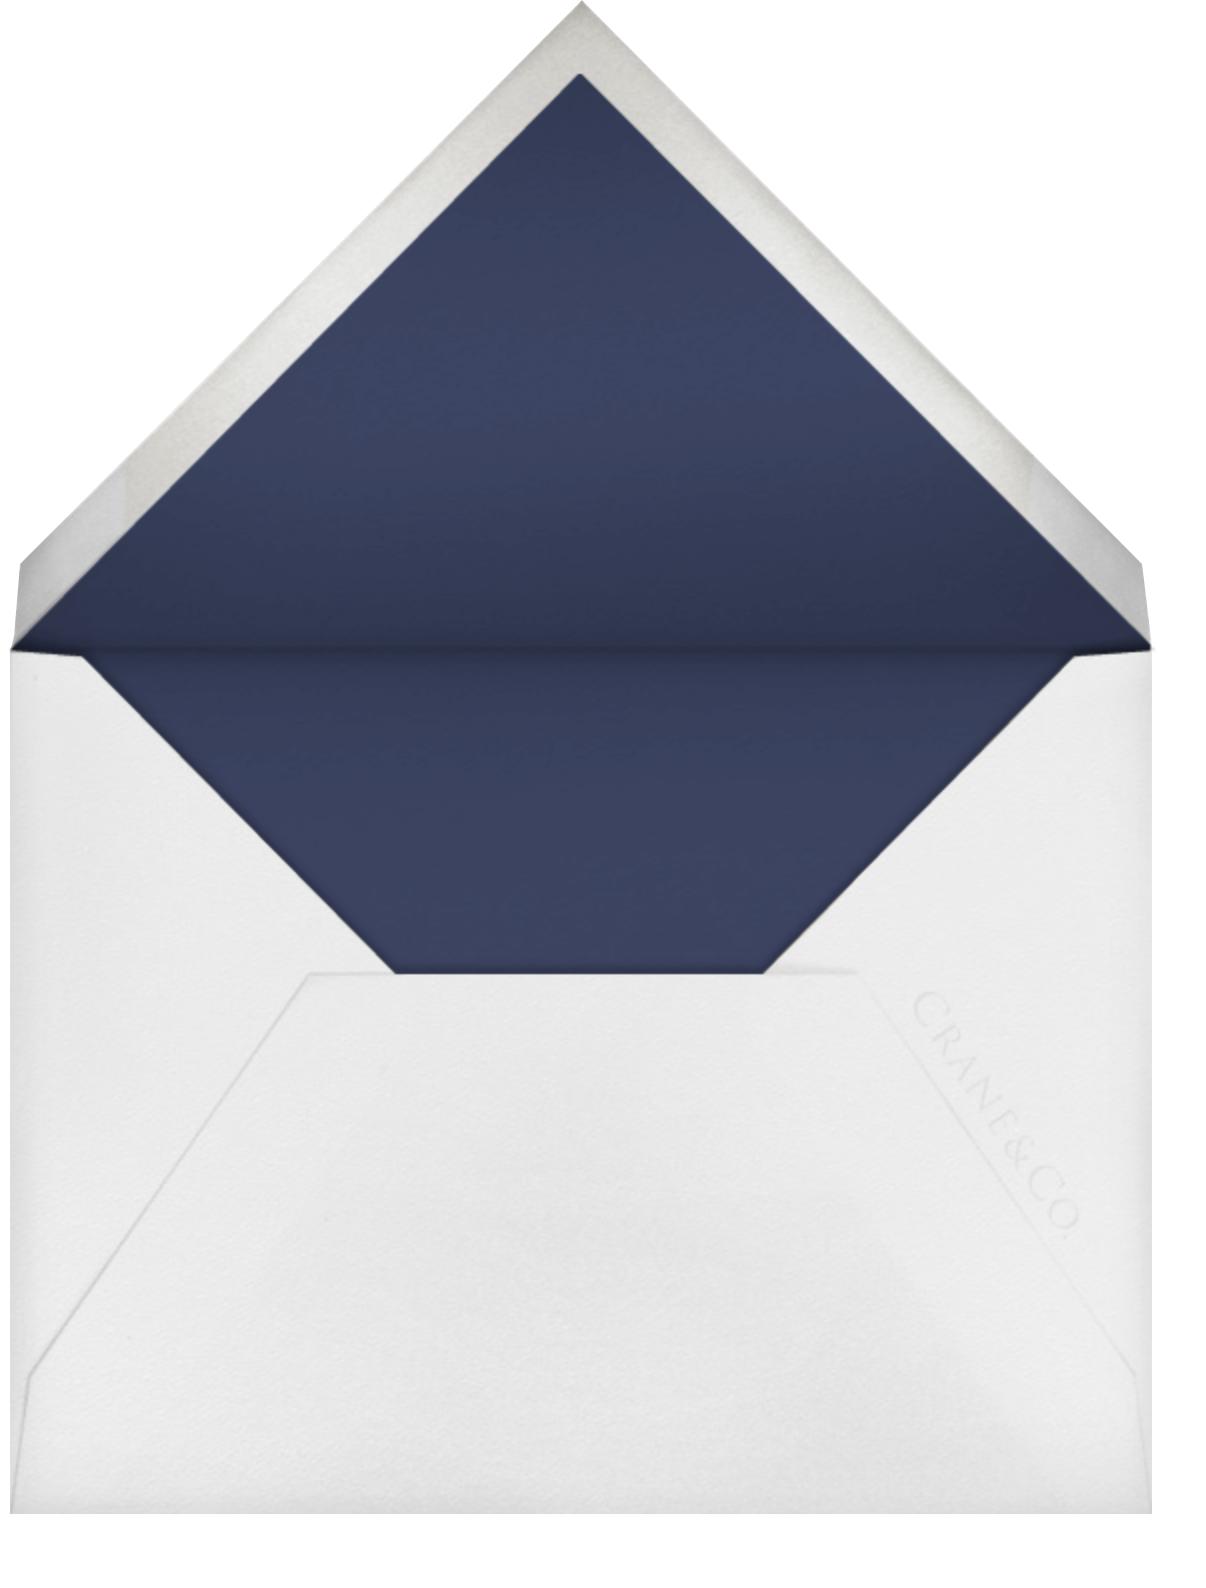 Winston - Pearl White - Paperless Post - Bar and bat mitzvah - envelope back